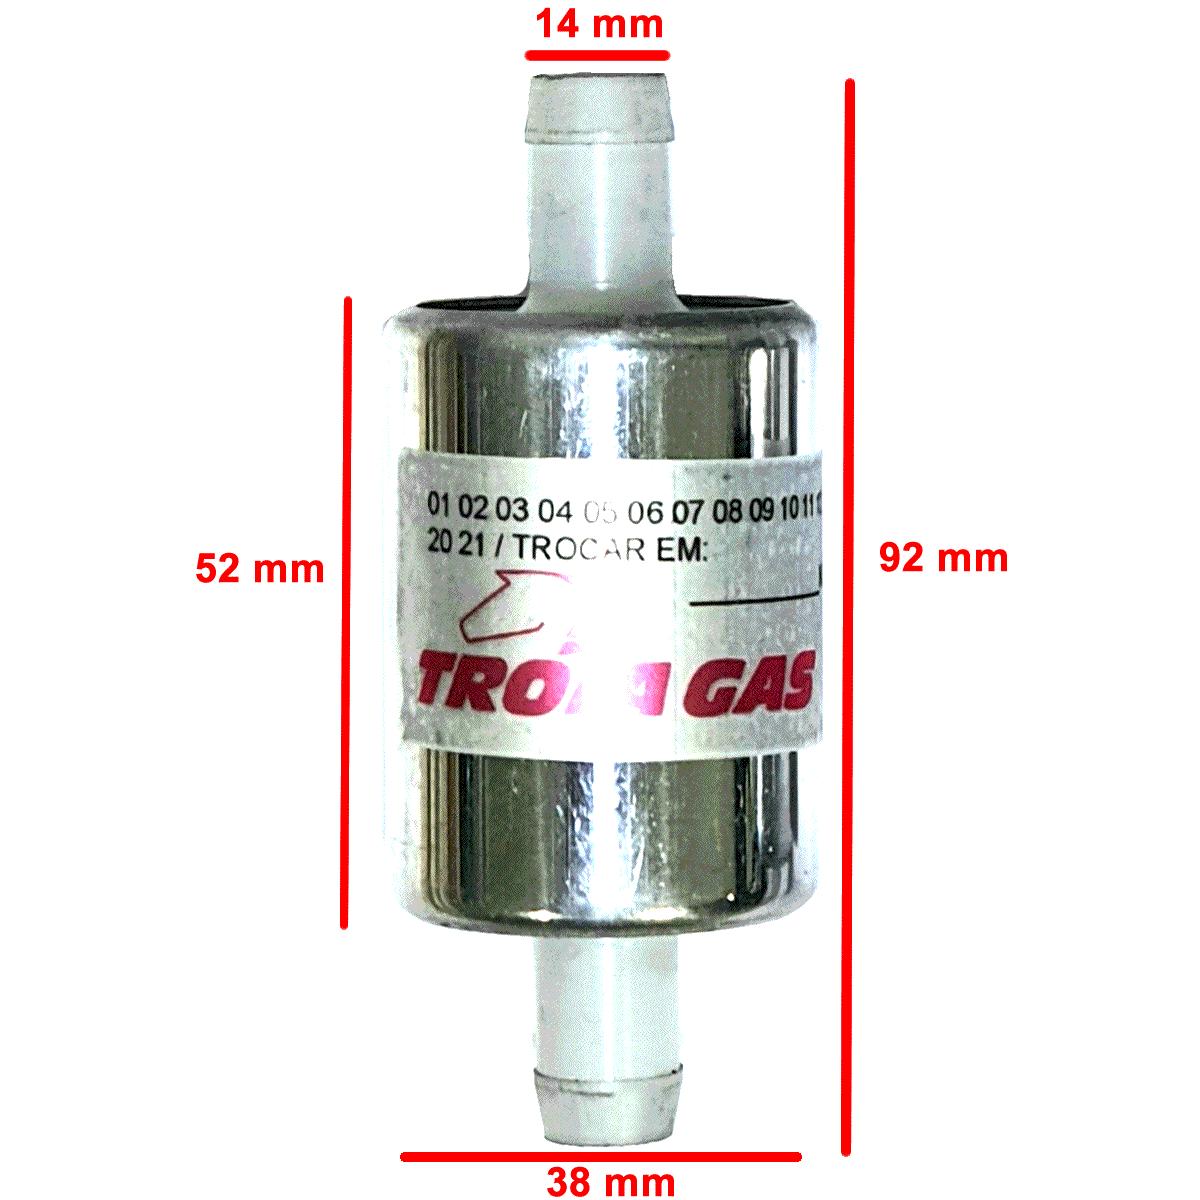 12 Filtros GNV 14 mm TROIAGAS 5ª e 6ª geração protege bicos Landi Renzo Lovato MED